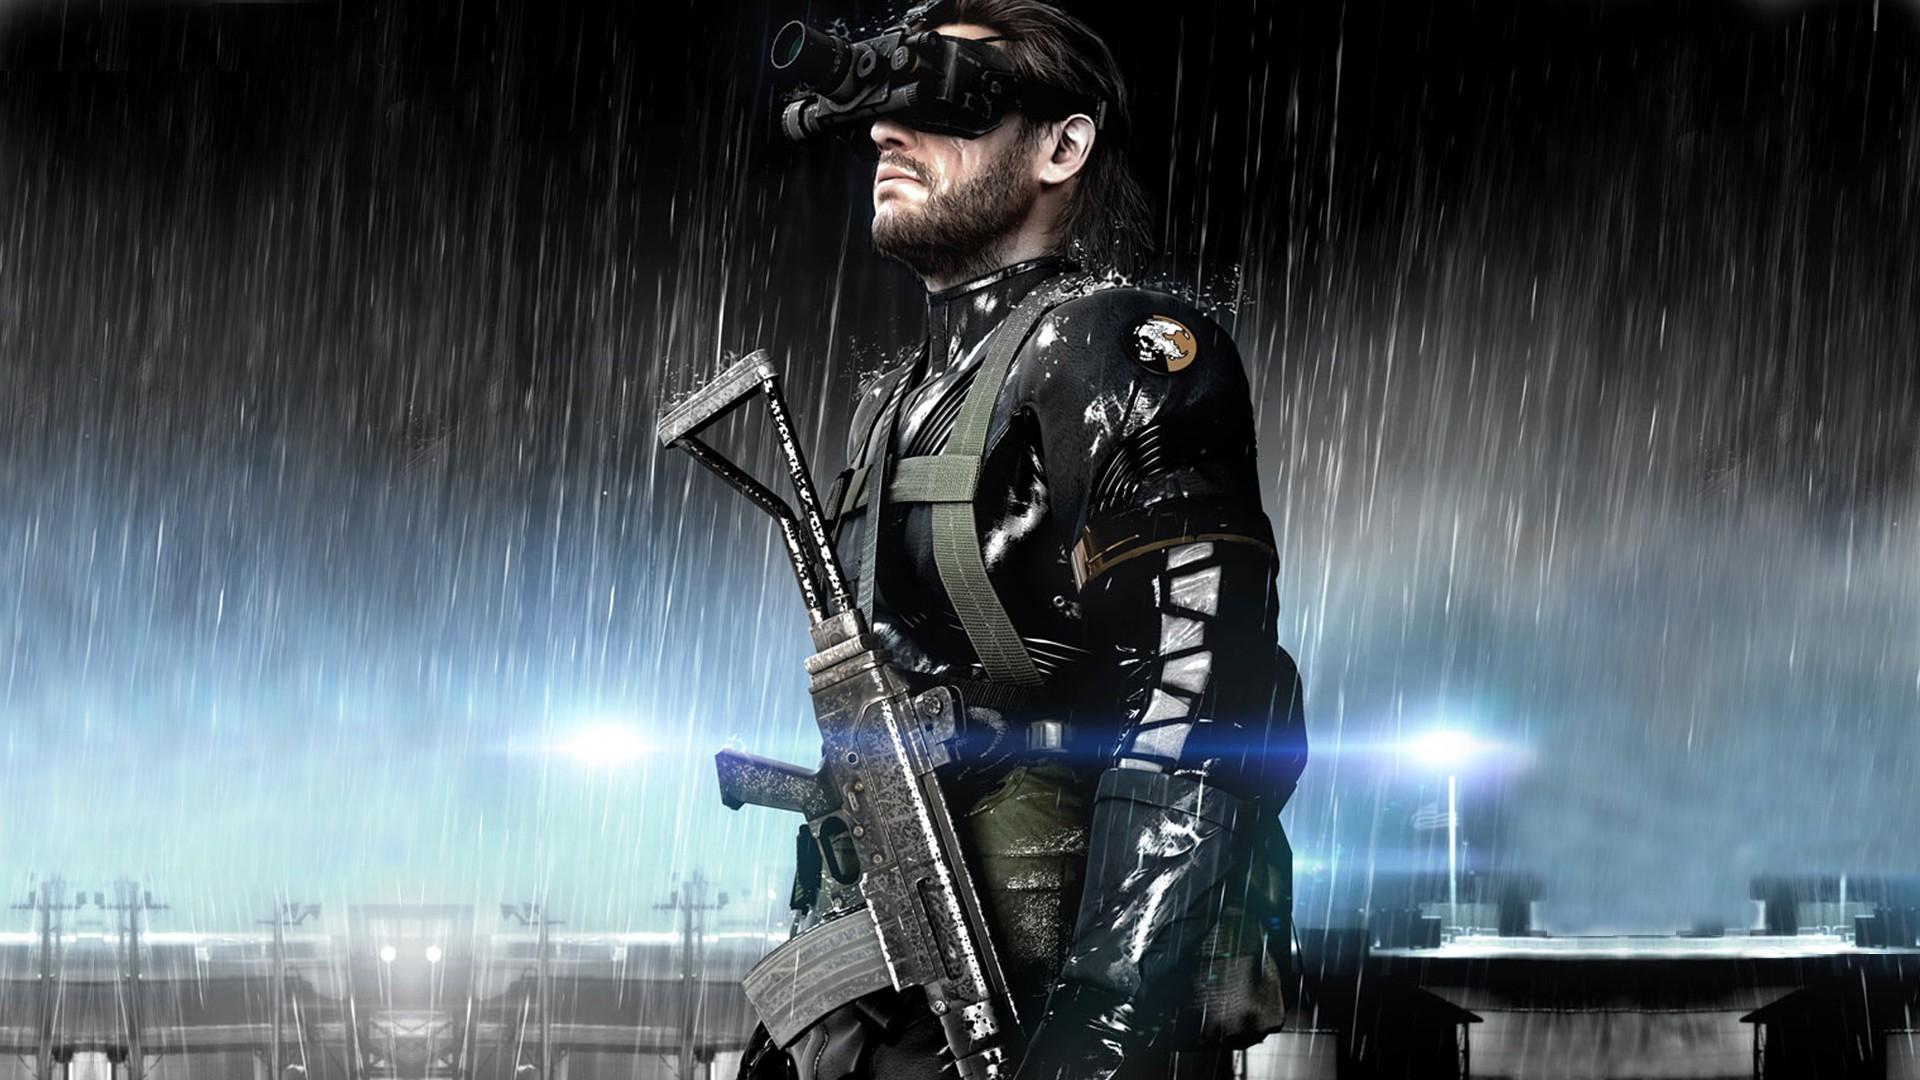 metal gear solid v ground zeroes big boss video games wallpaper hd